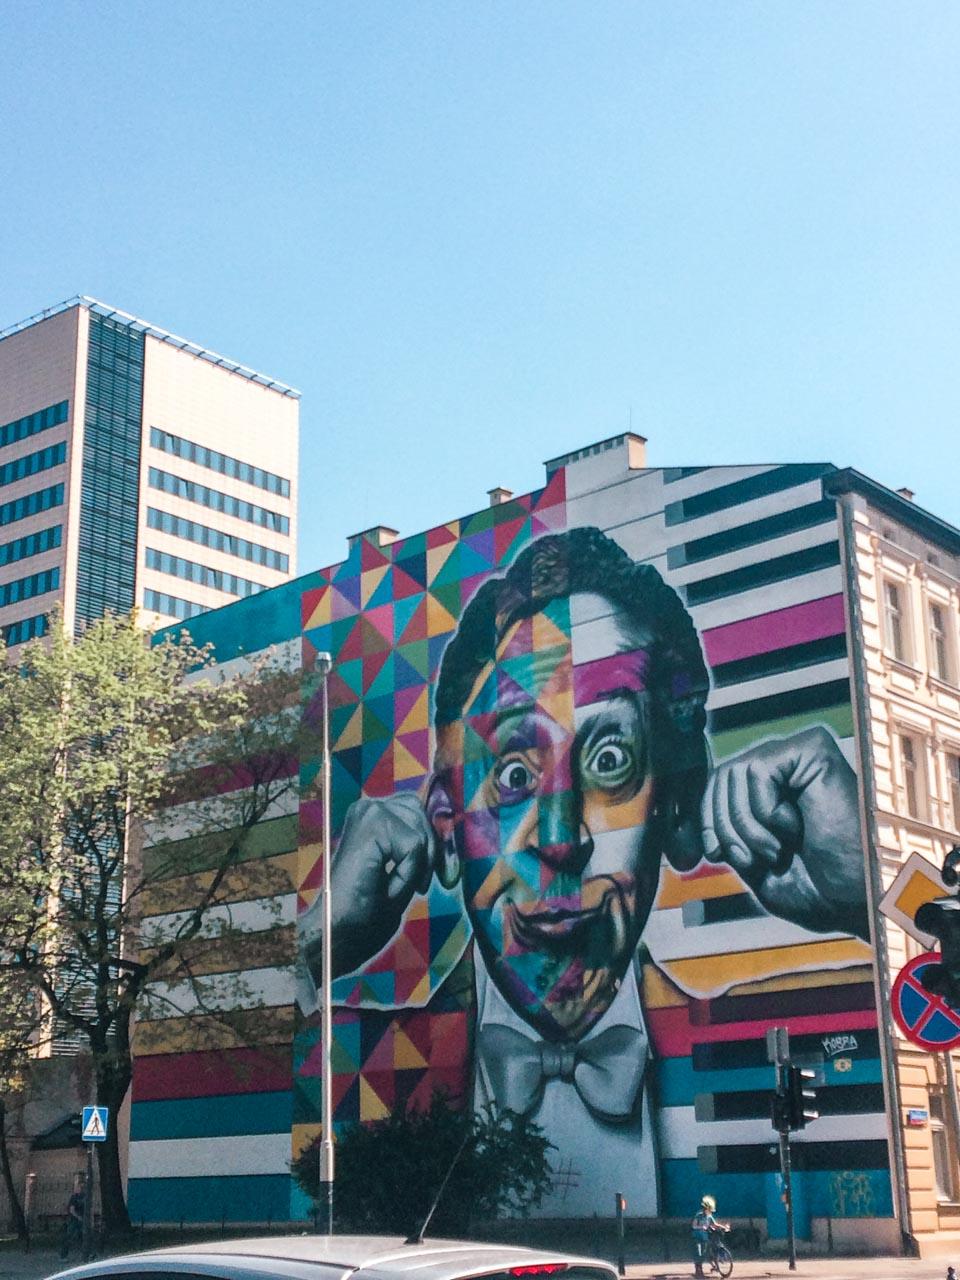 Arthur Rubinstein mural in Łódź, Poland